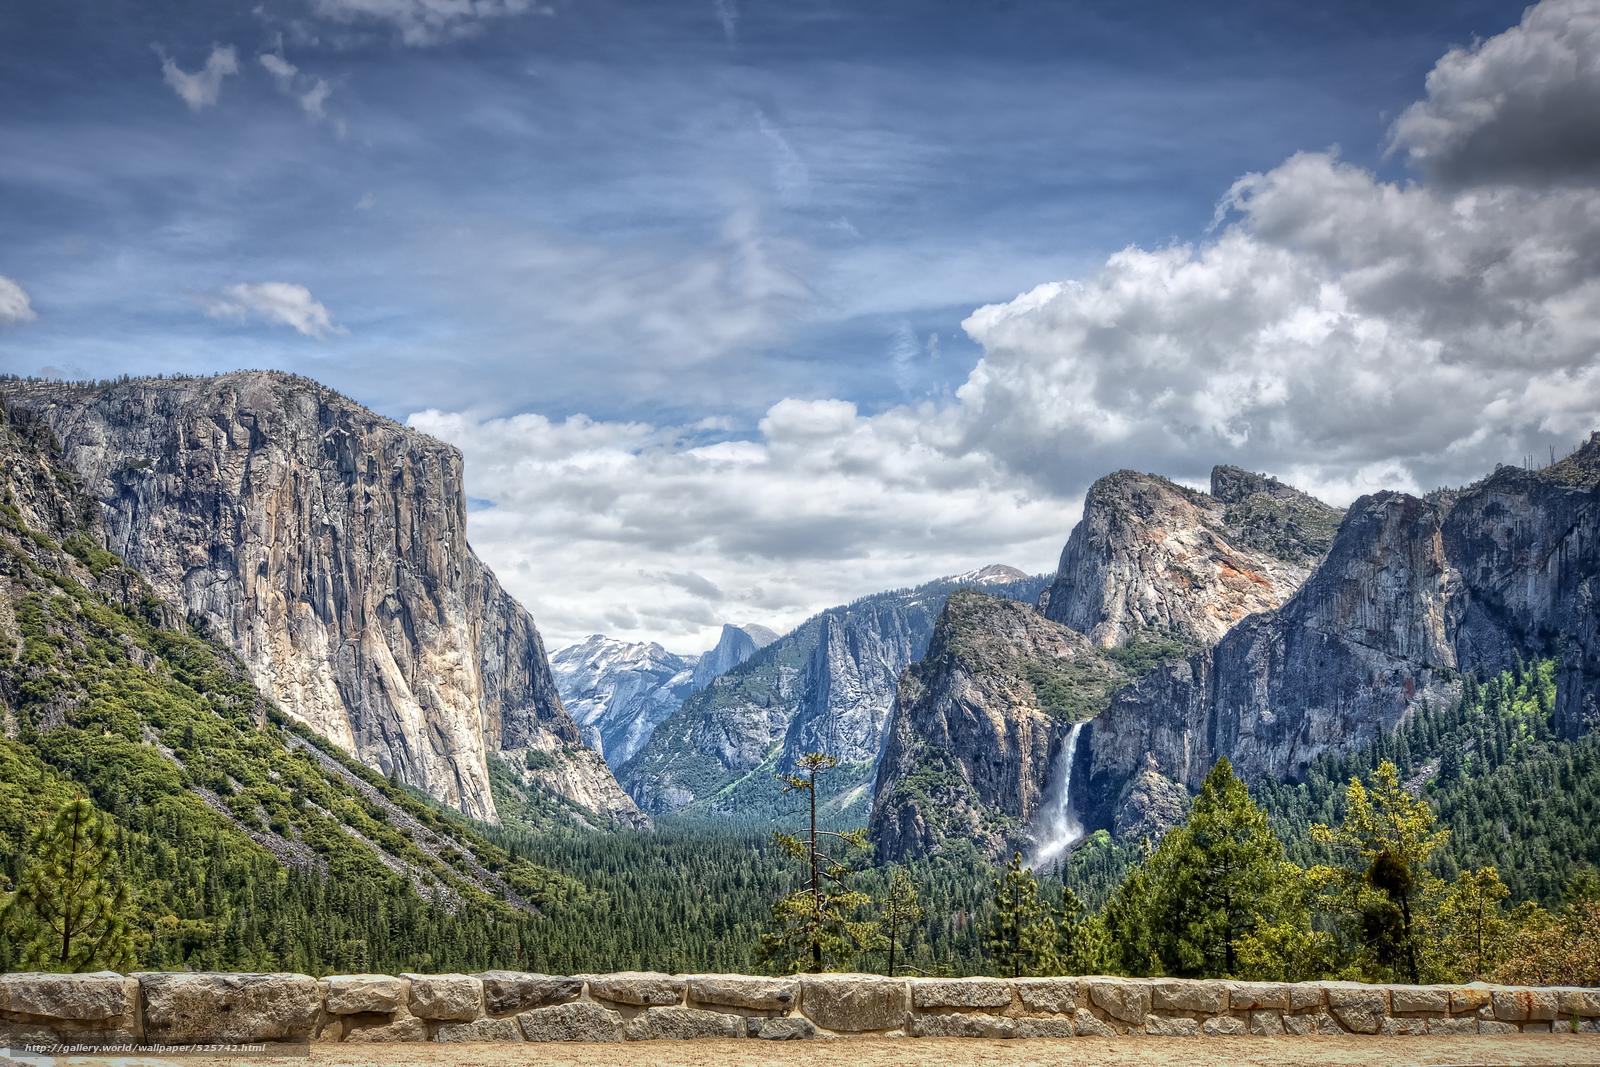 wallpaper yosemite national park california USA desktop 1600x1067